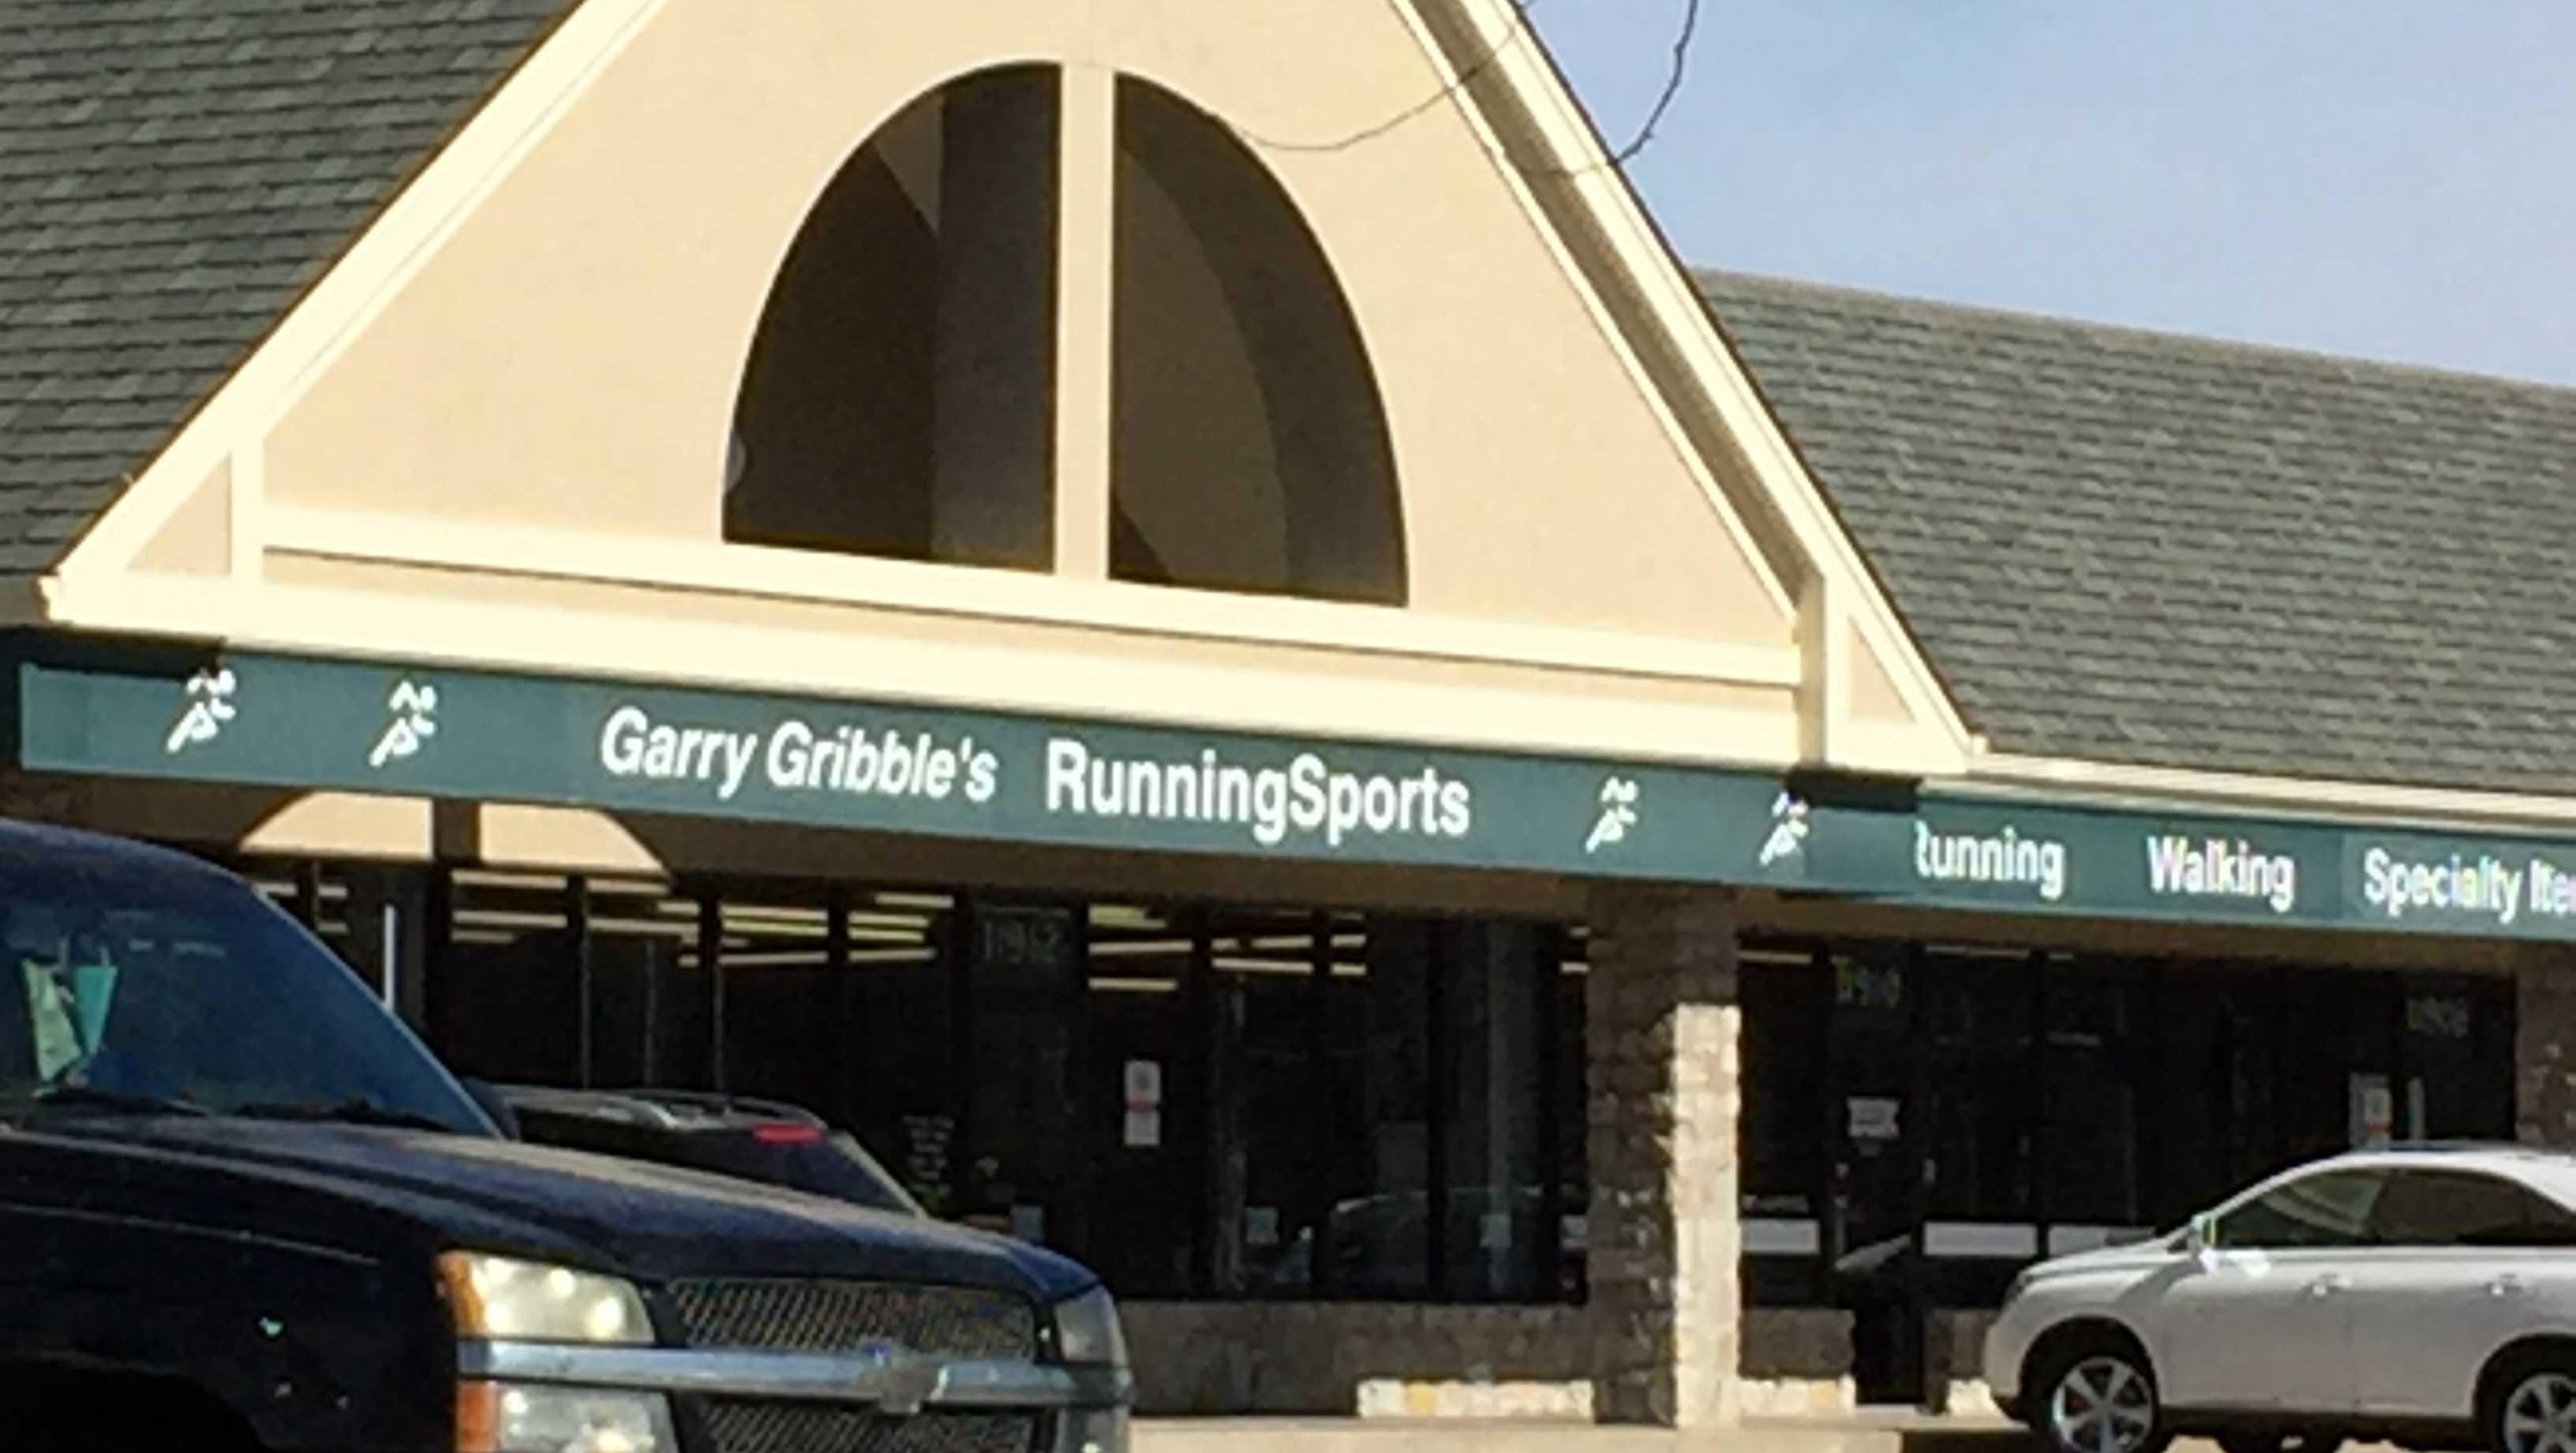 Garry Gribble's Running Sports